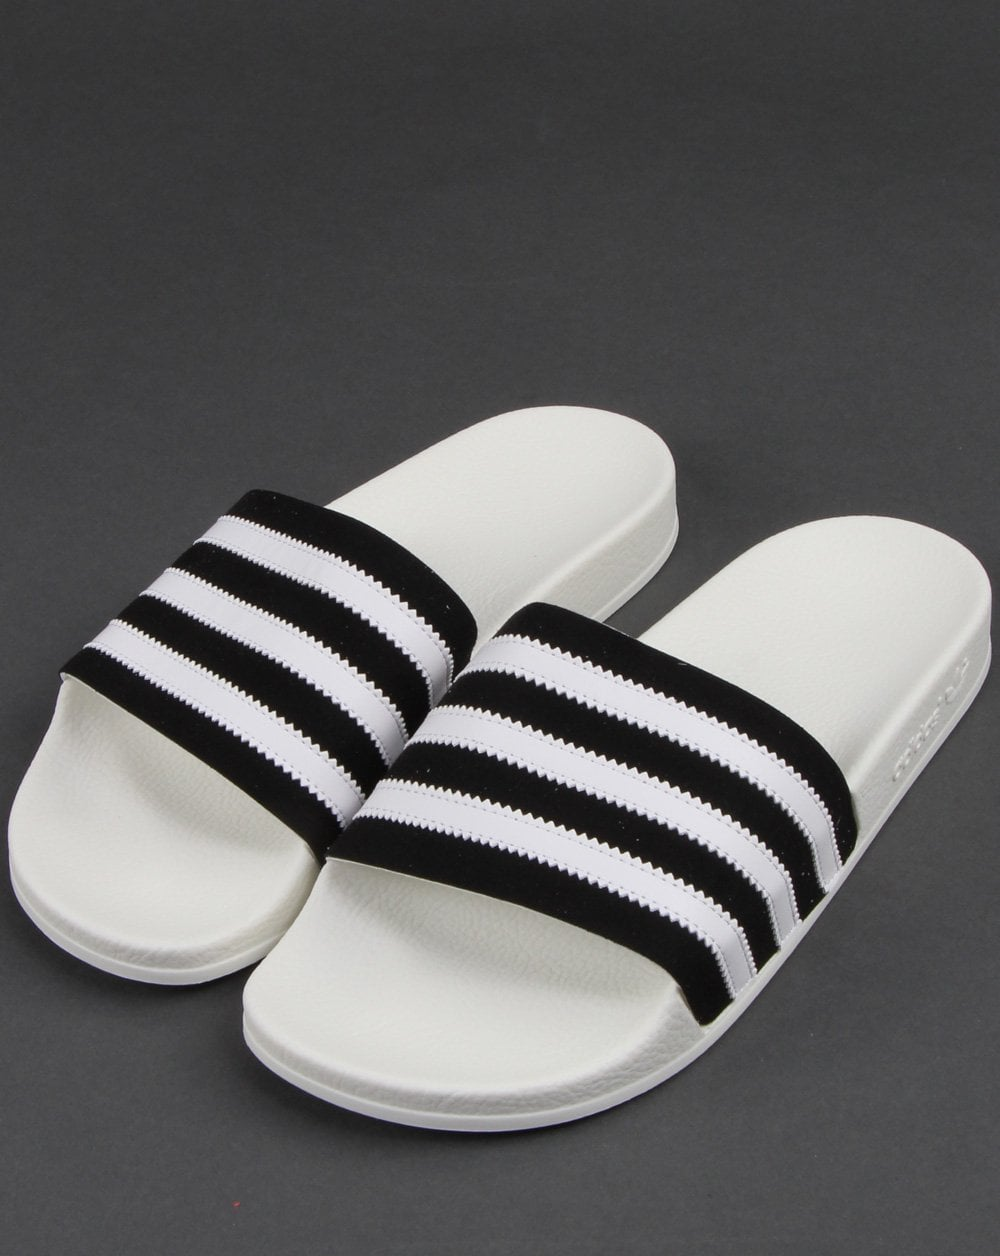 Adidas Adilette Slides BlackWhite